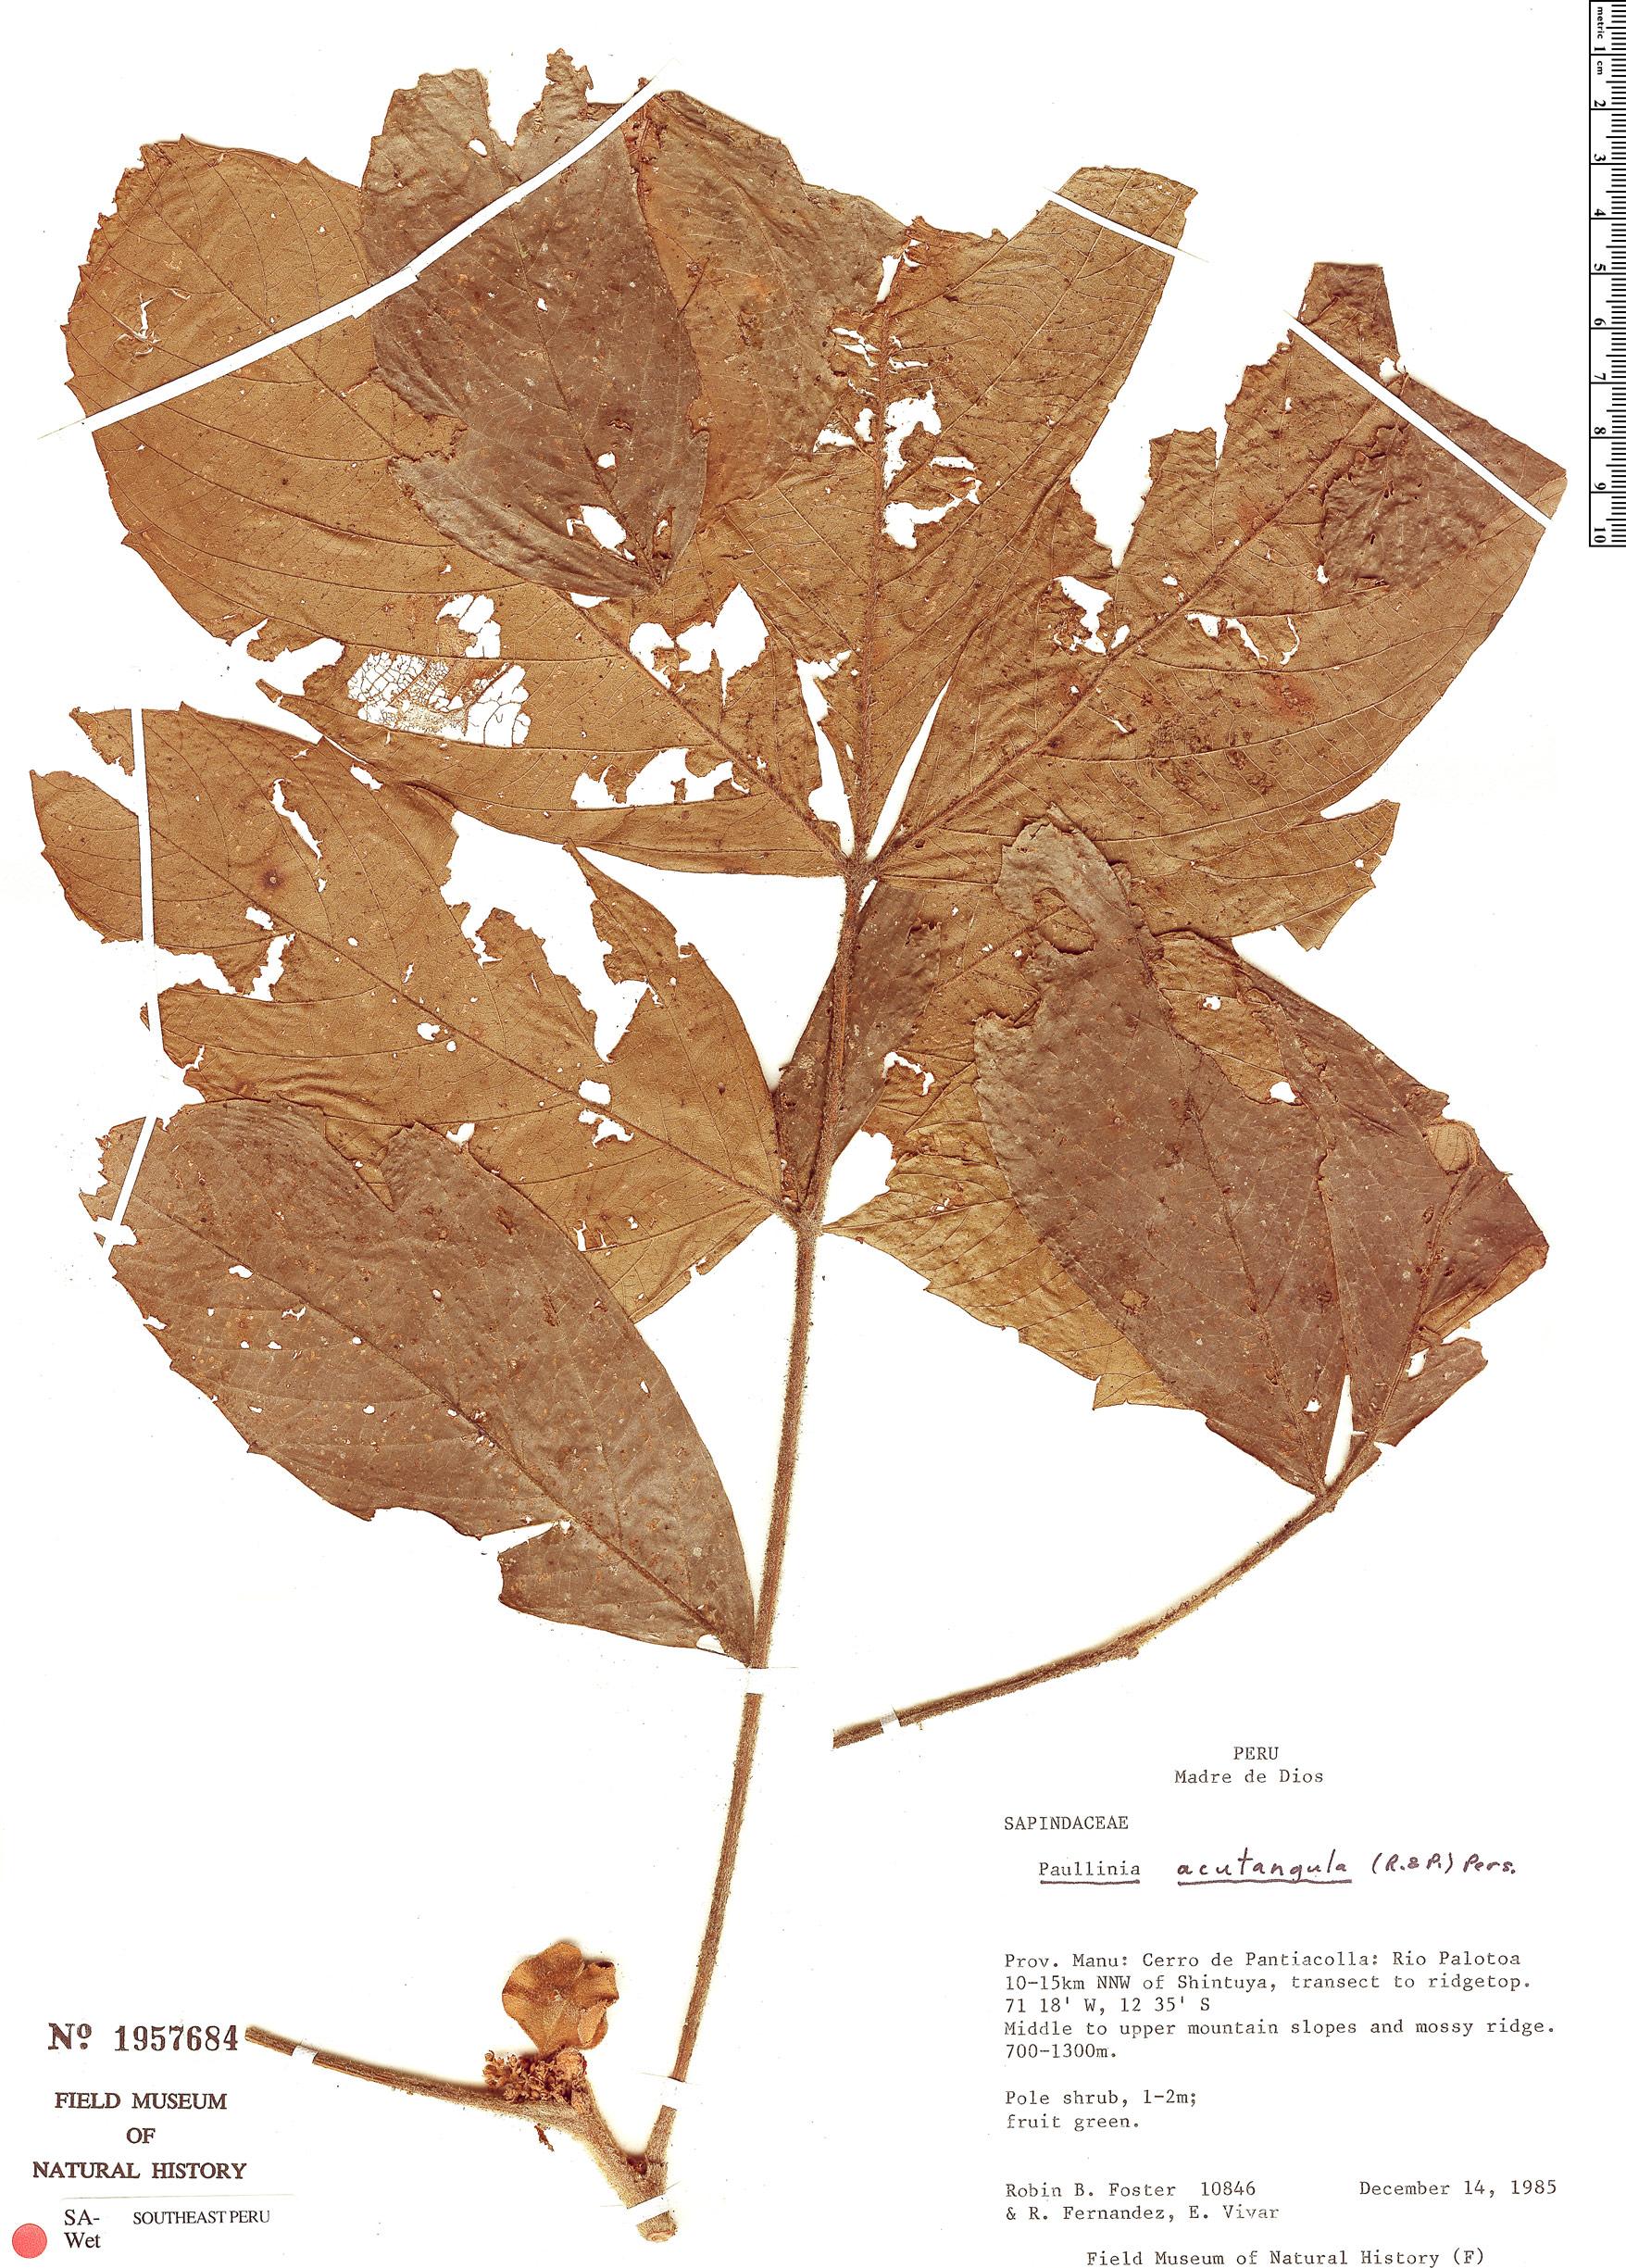 Specimen: Paullinia acutangula